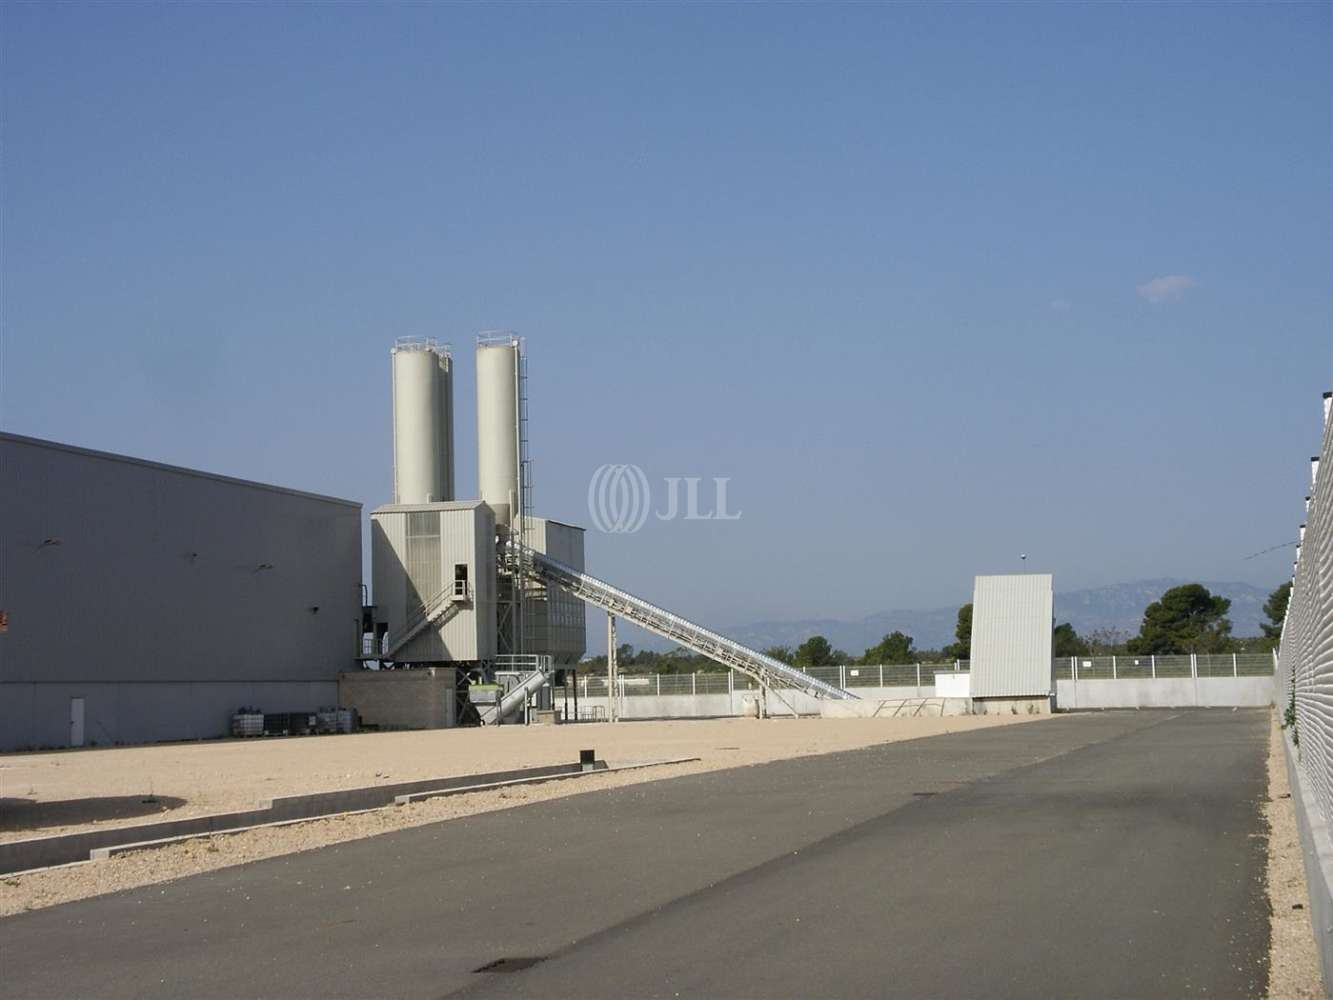 Naves industriales y logísticas Tortosa, 43500 - Nave Industrial - B0511 NAVE EN VENTA TORTOSA-CATALUNYA SUD - 23206